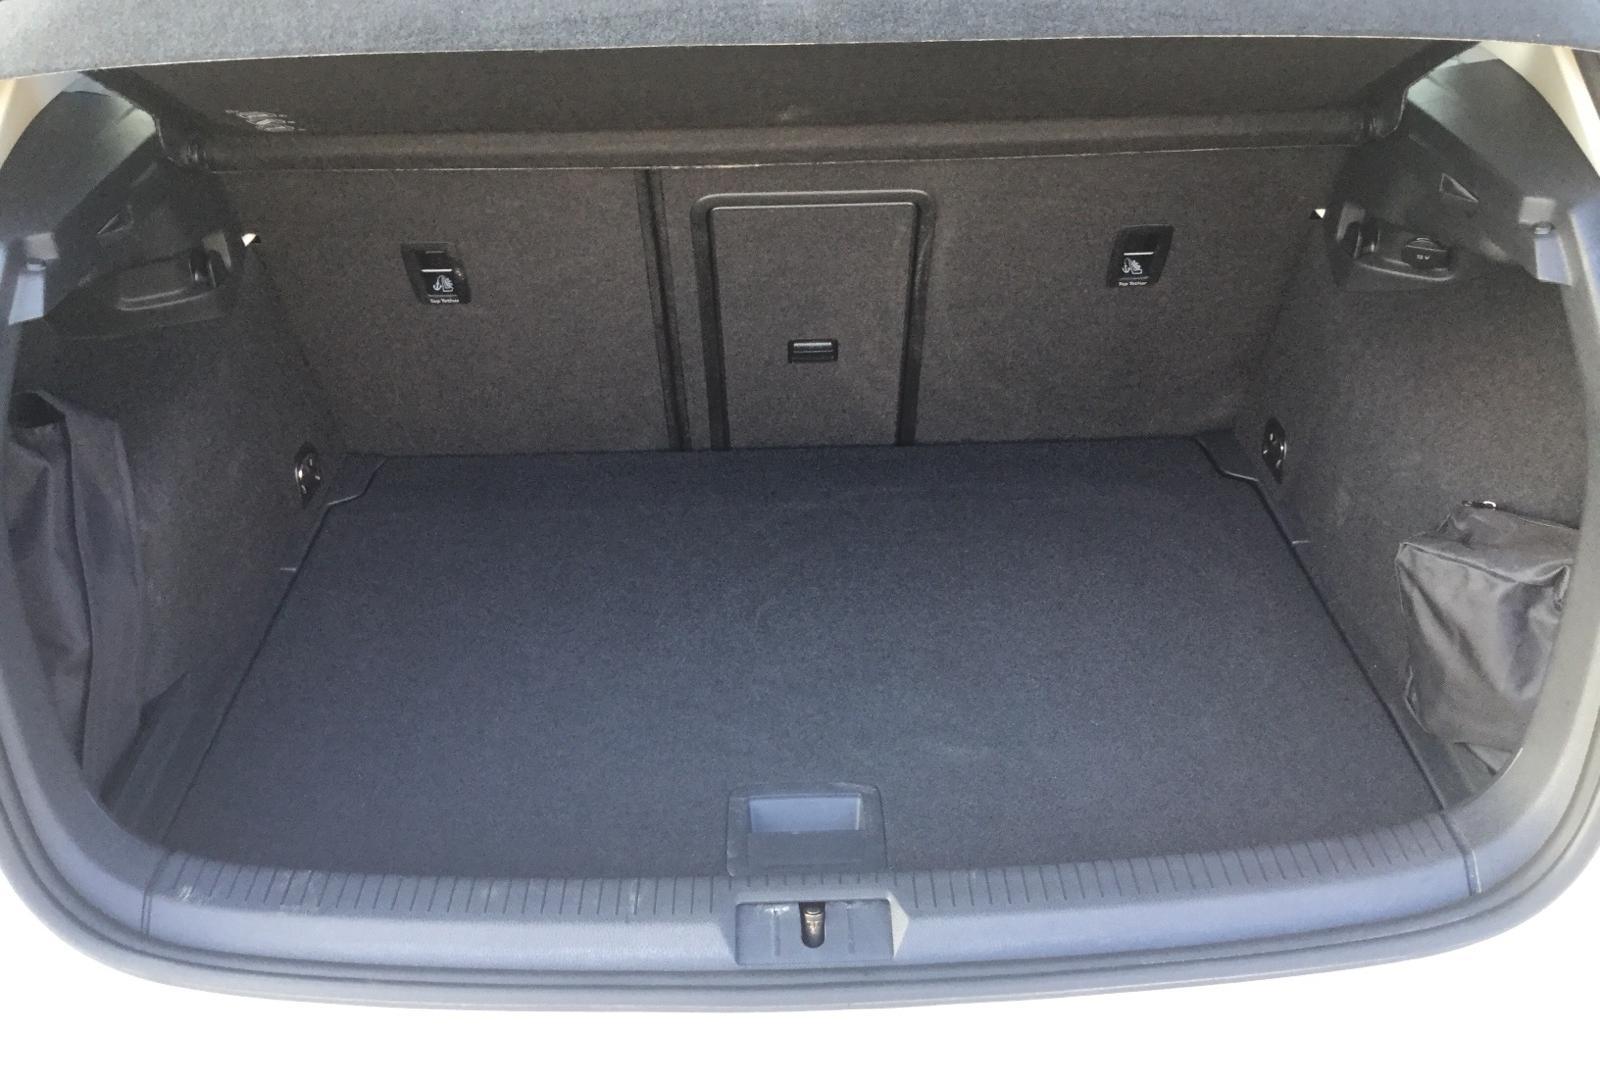 VW Golf VII 1.4 TGI 5dr (110hk) - 0 mil - Manuell - vit - 2016